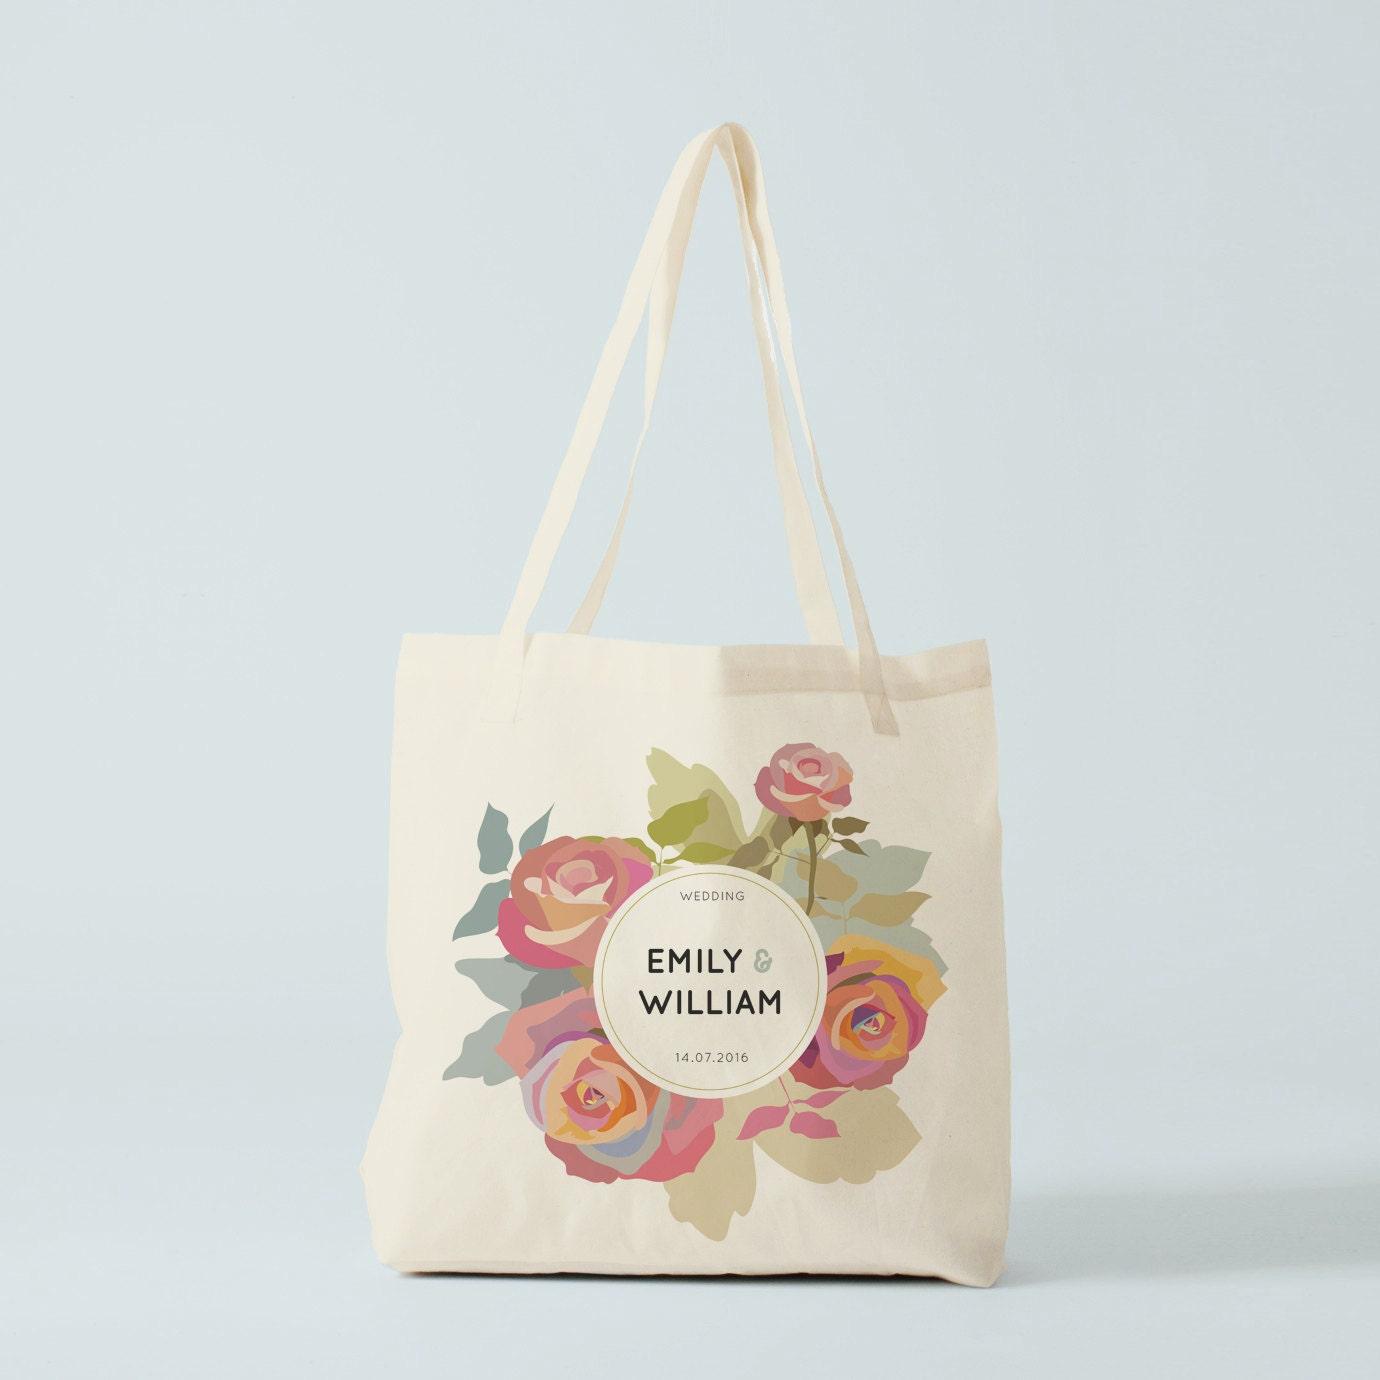 bride and groom s tote bag wedding tote bag wedding canvas bag